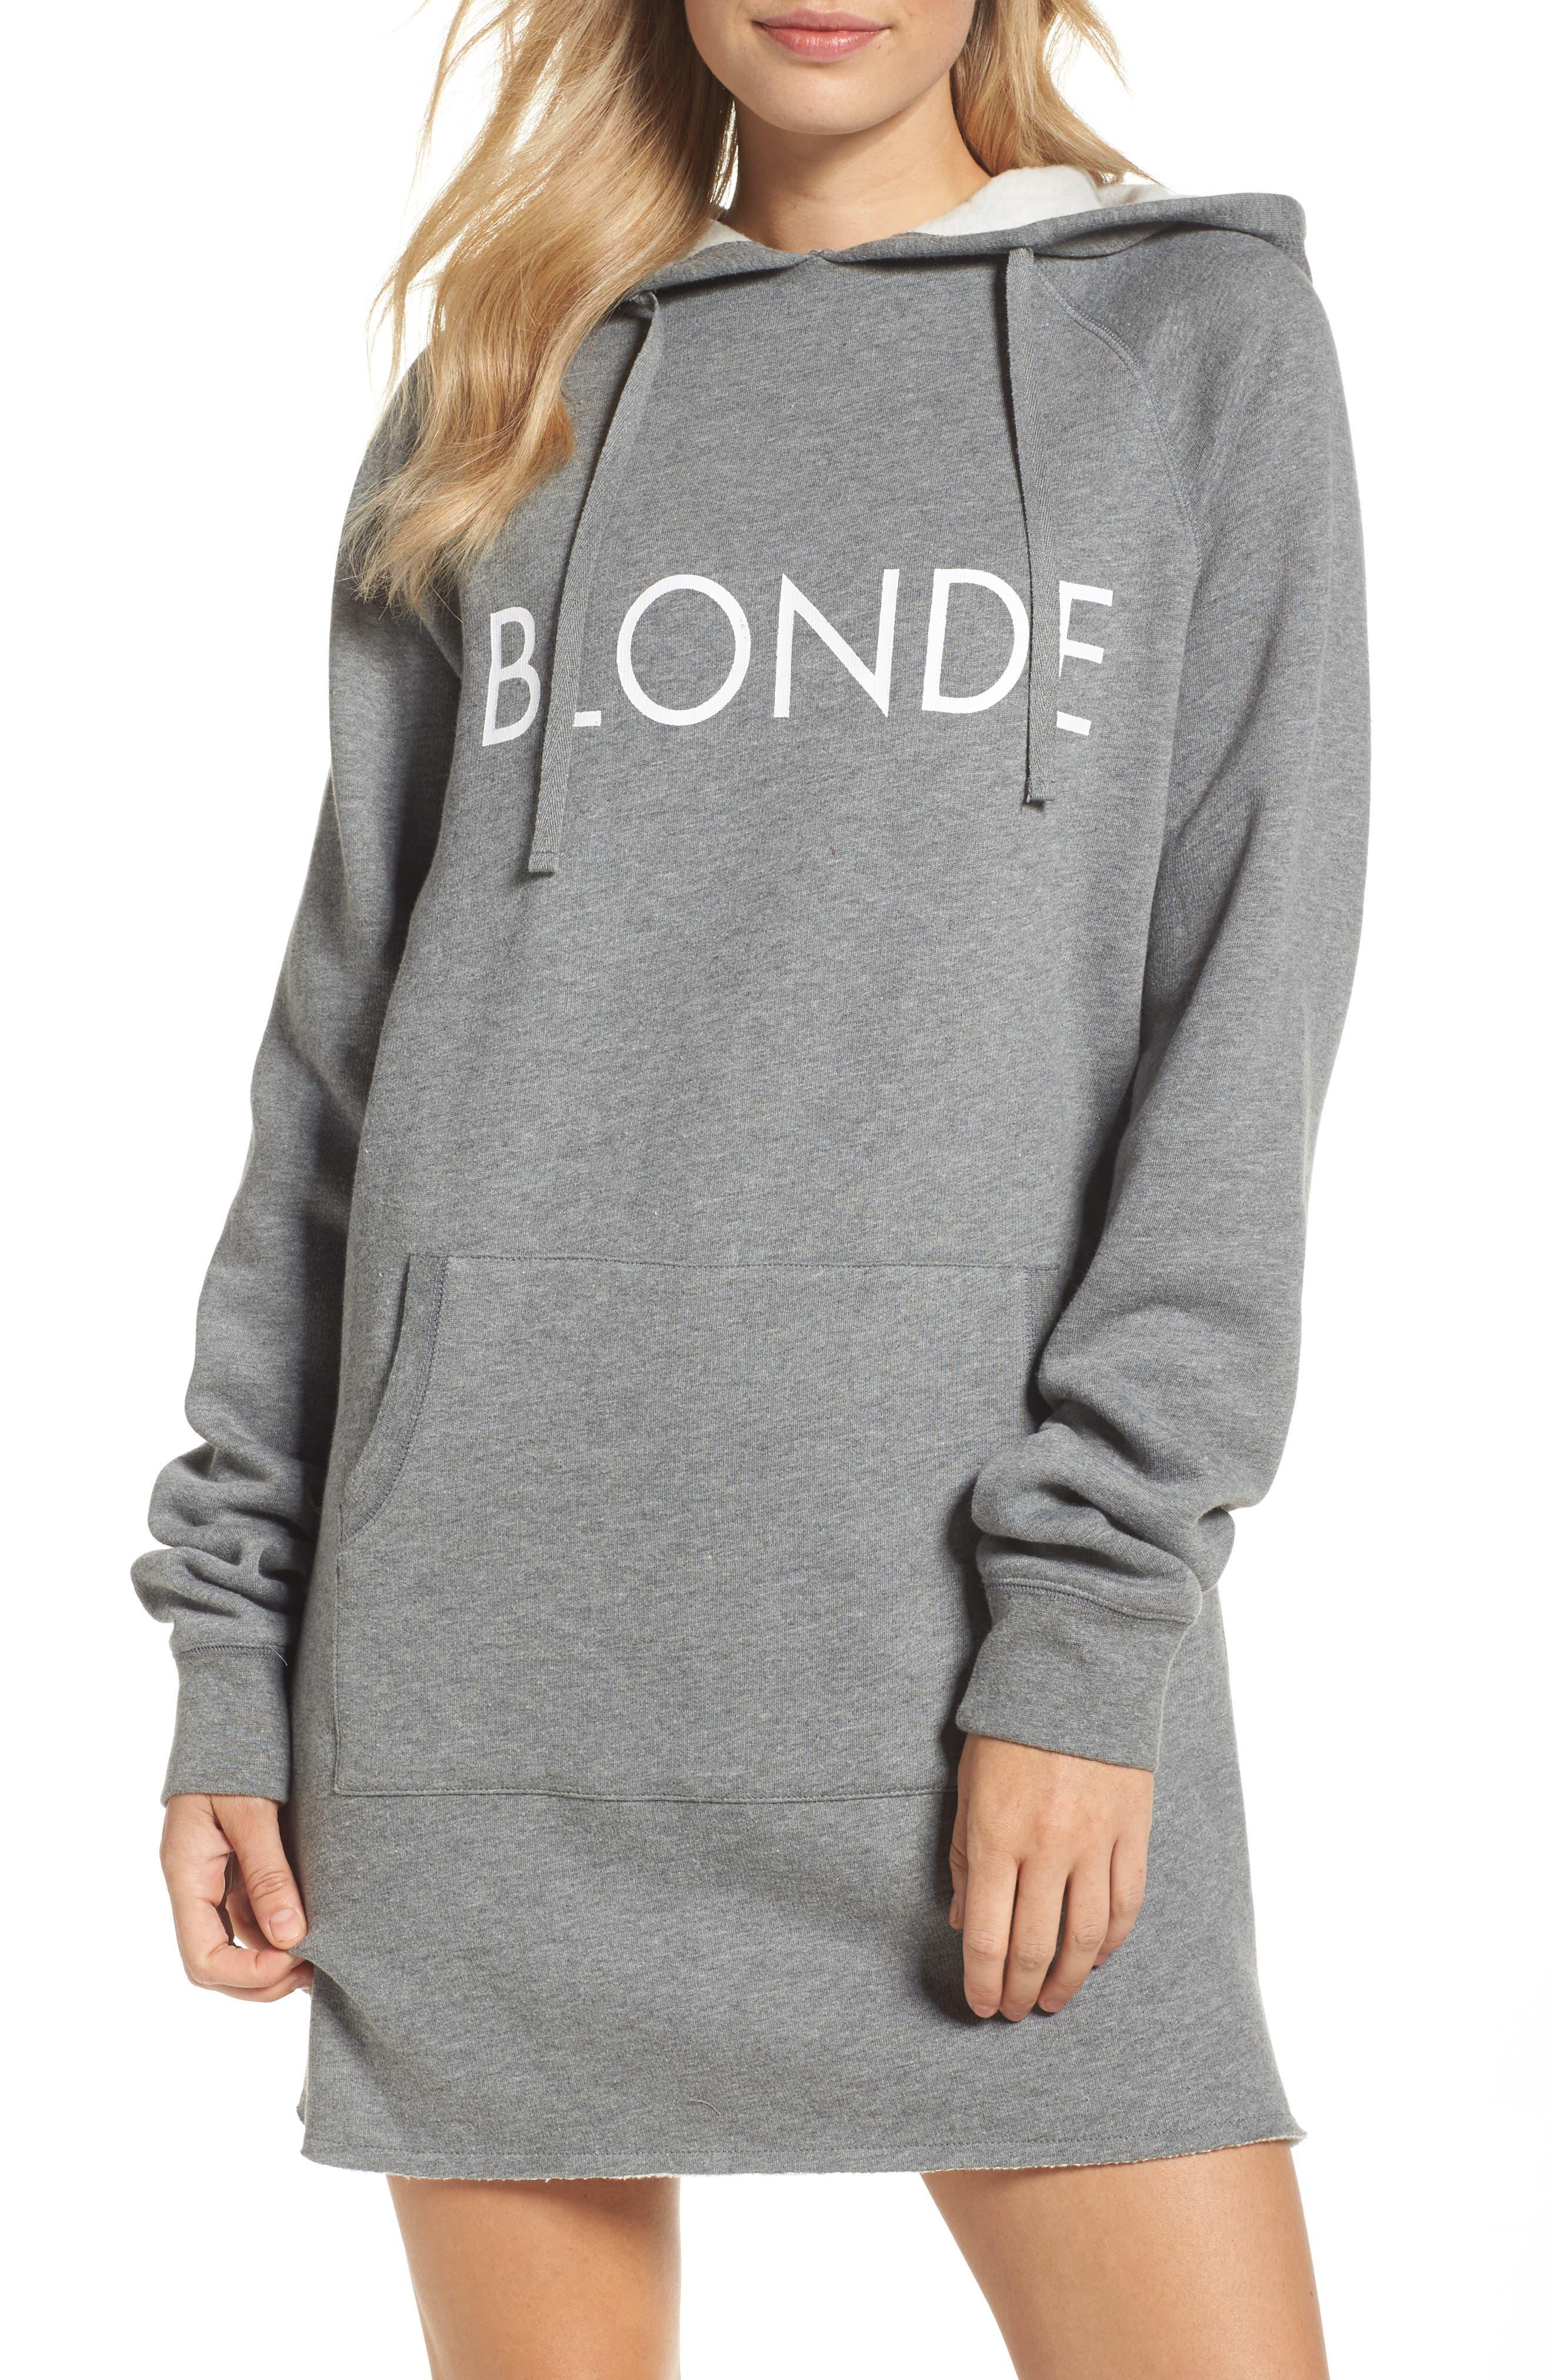 Main Image - BRUNETTE the Label Blonde Sweatshirt Dress